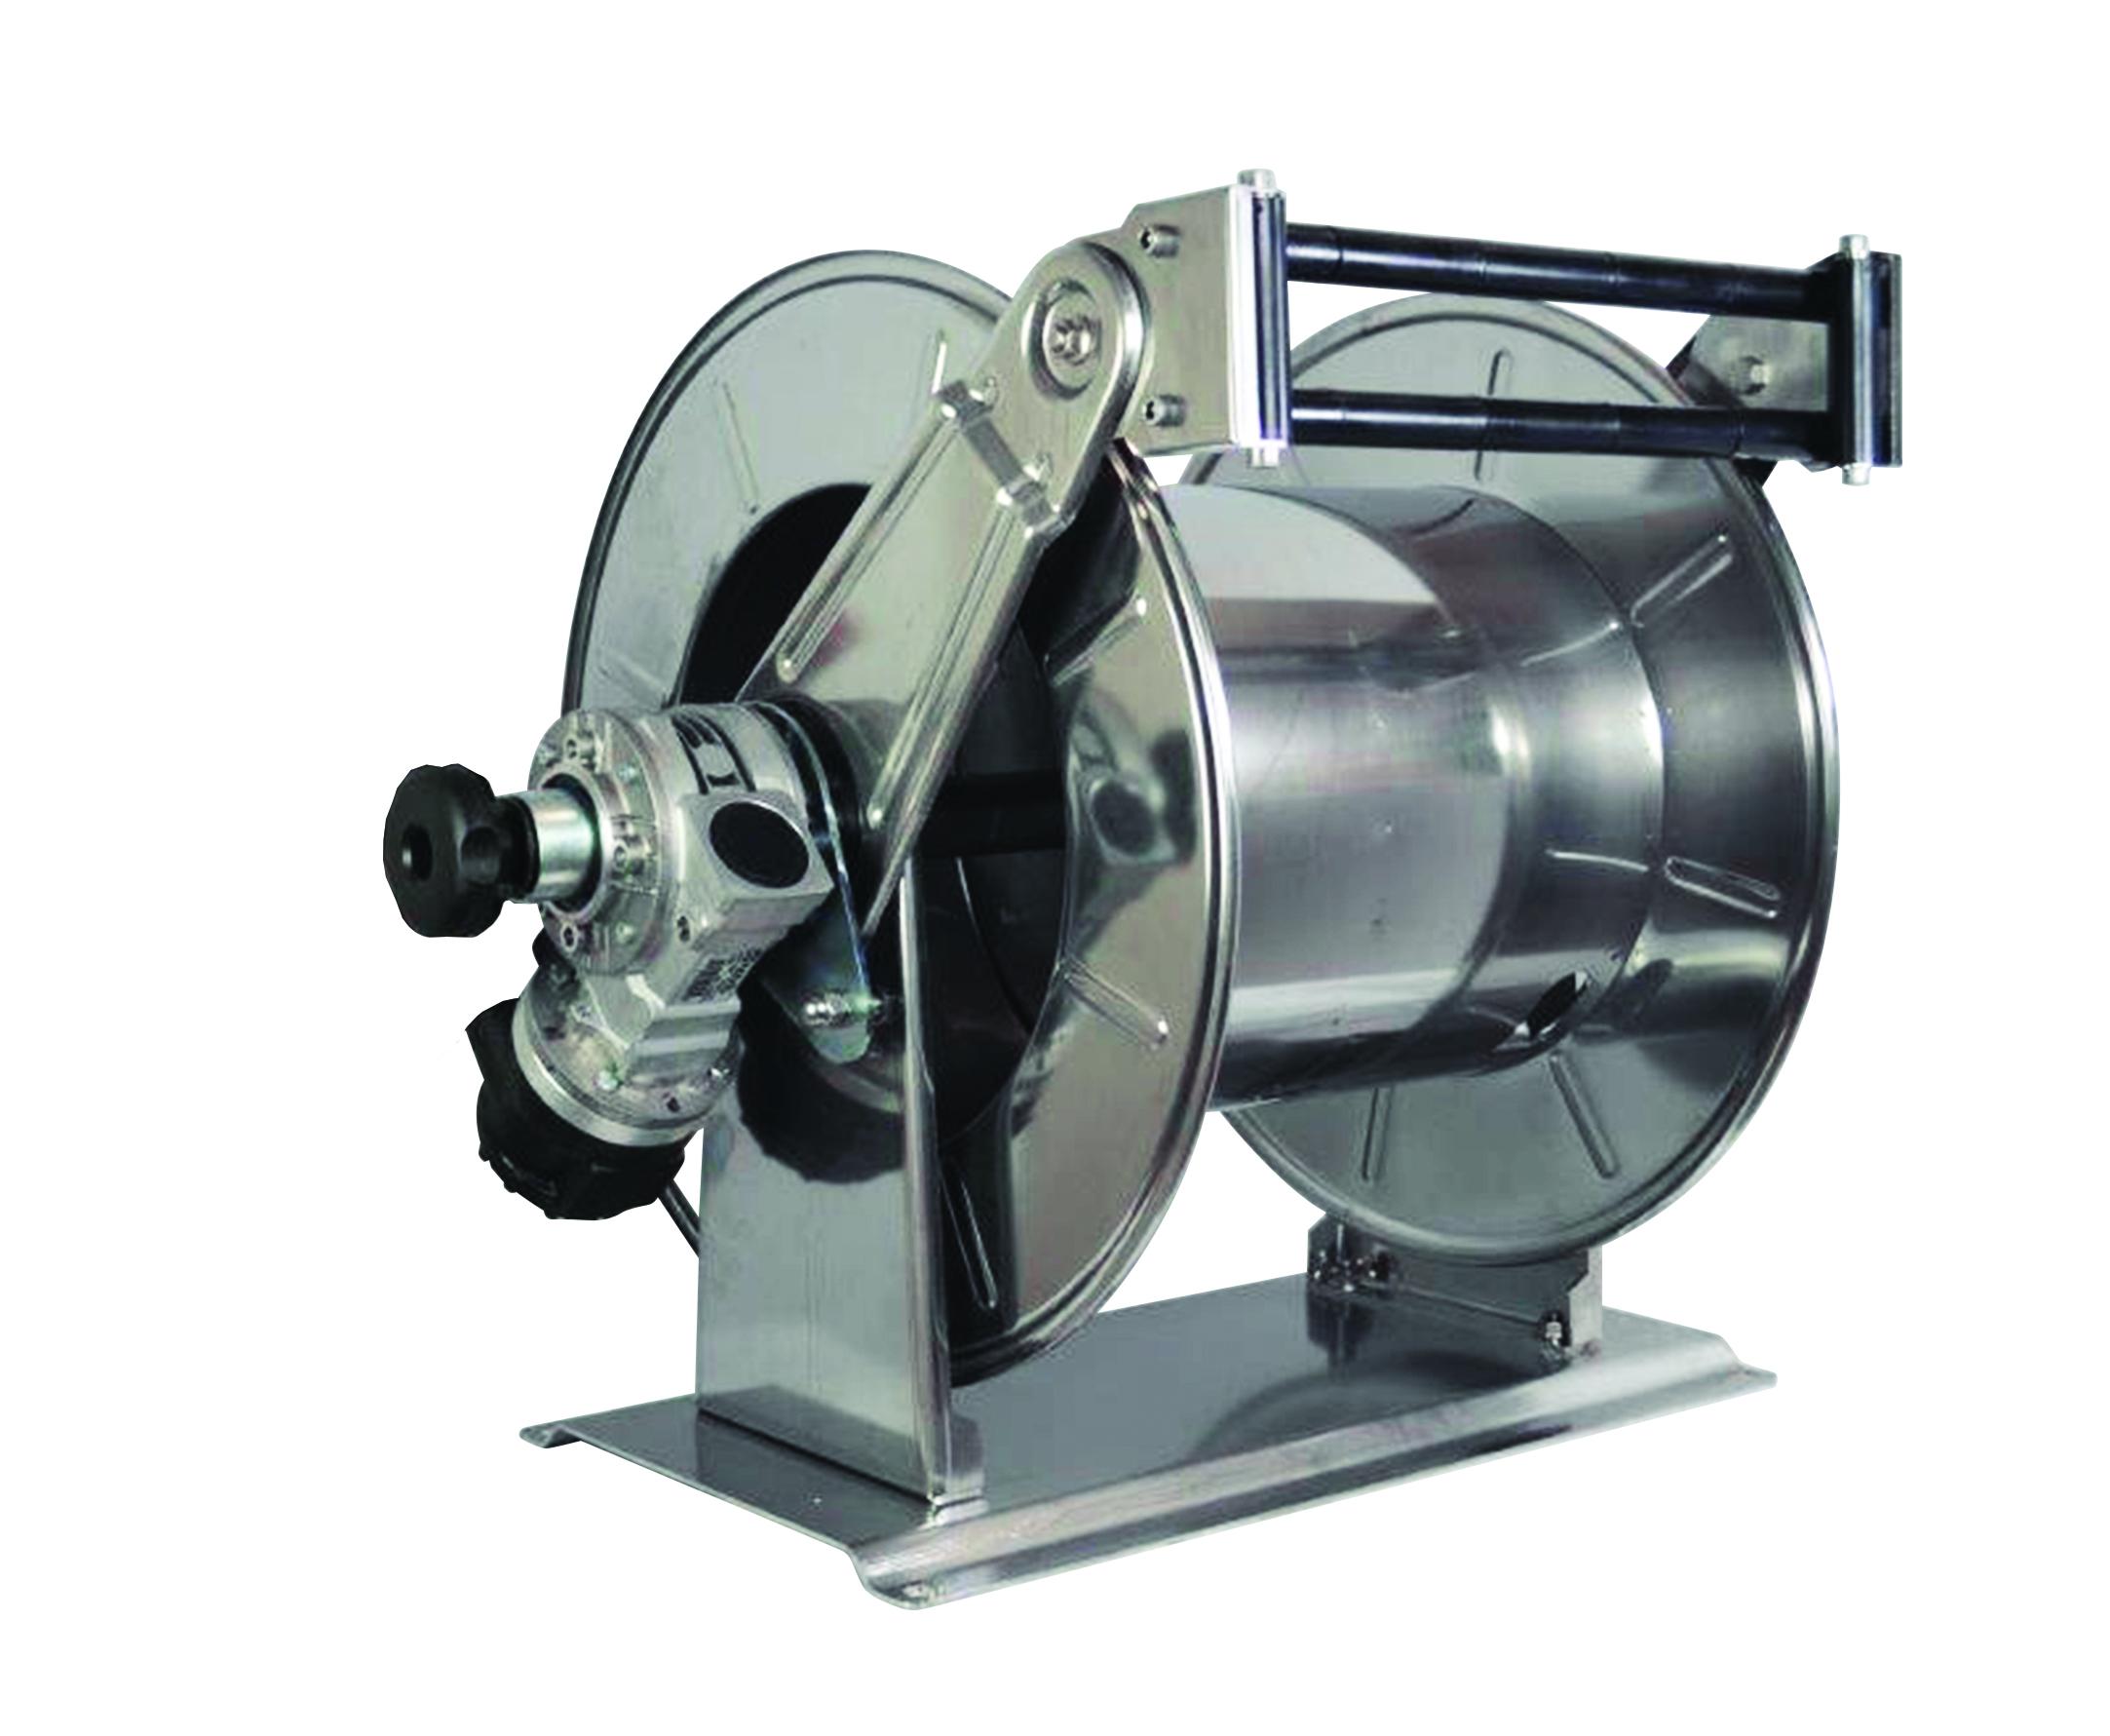 AVPN 2 - Pneumatic Motor Driven hose reels